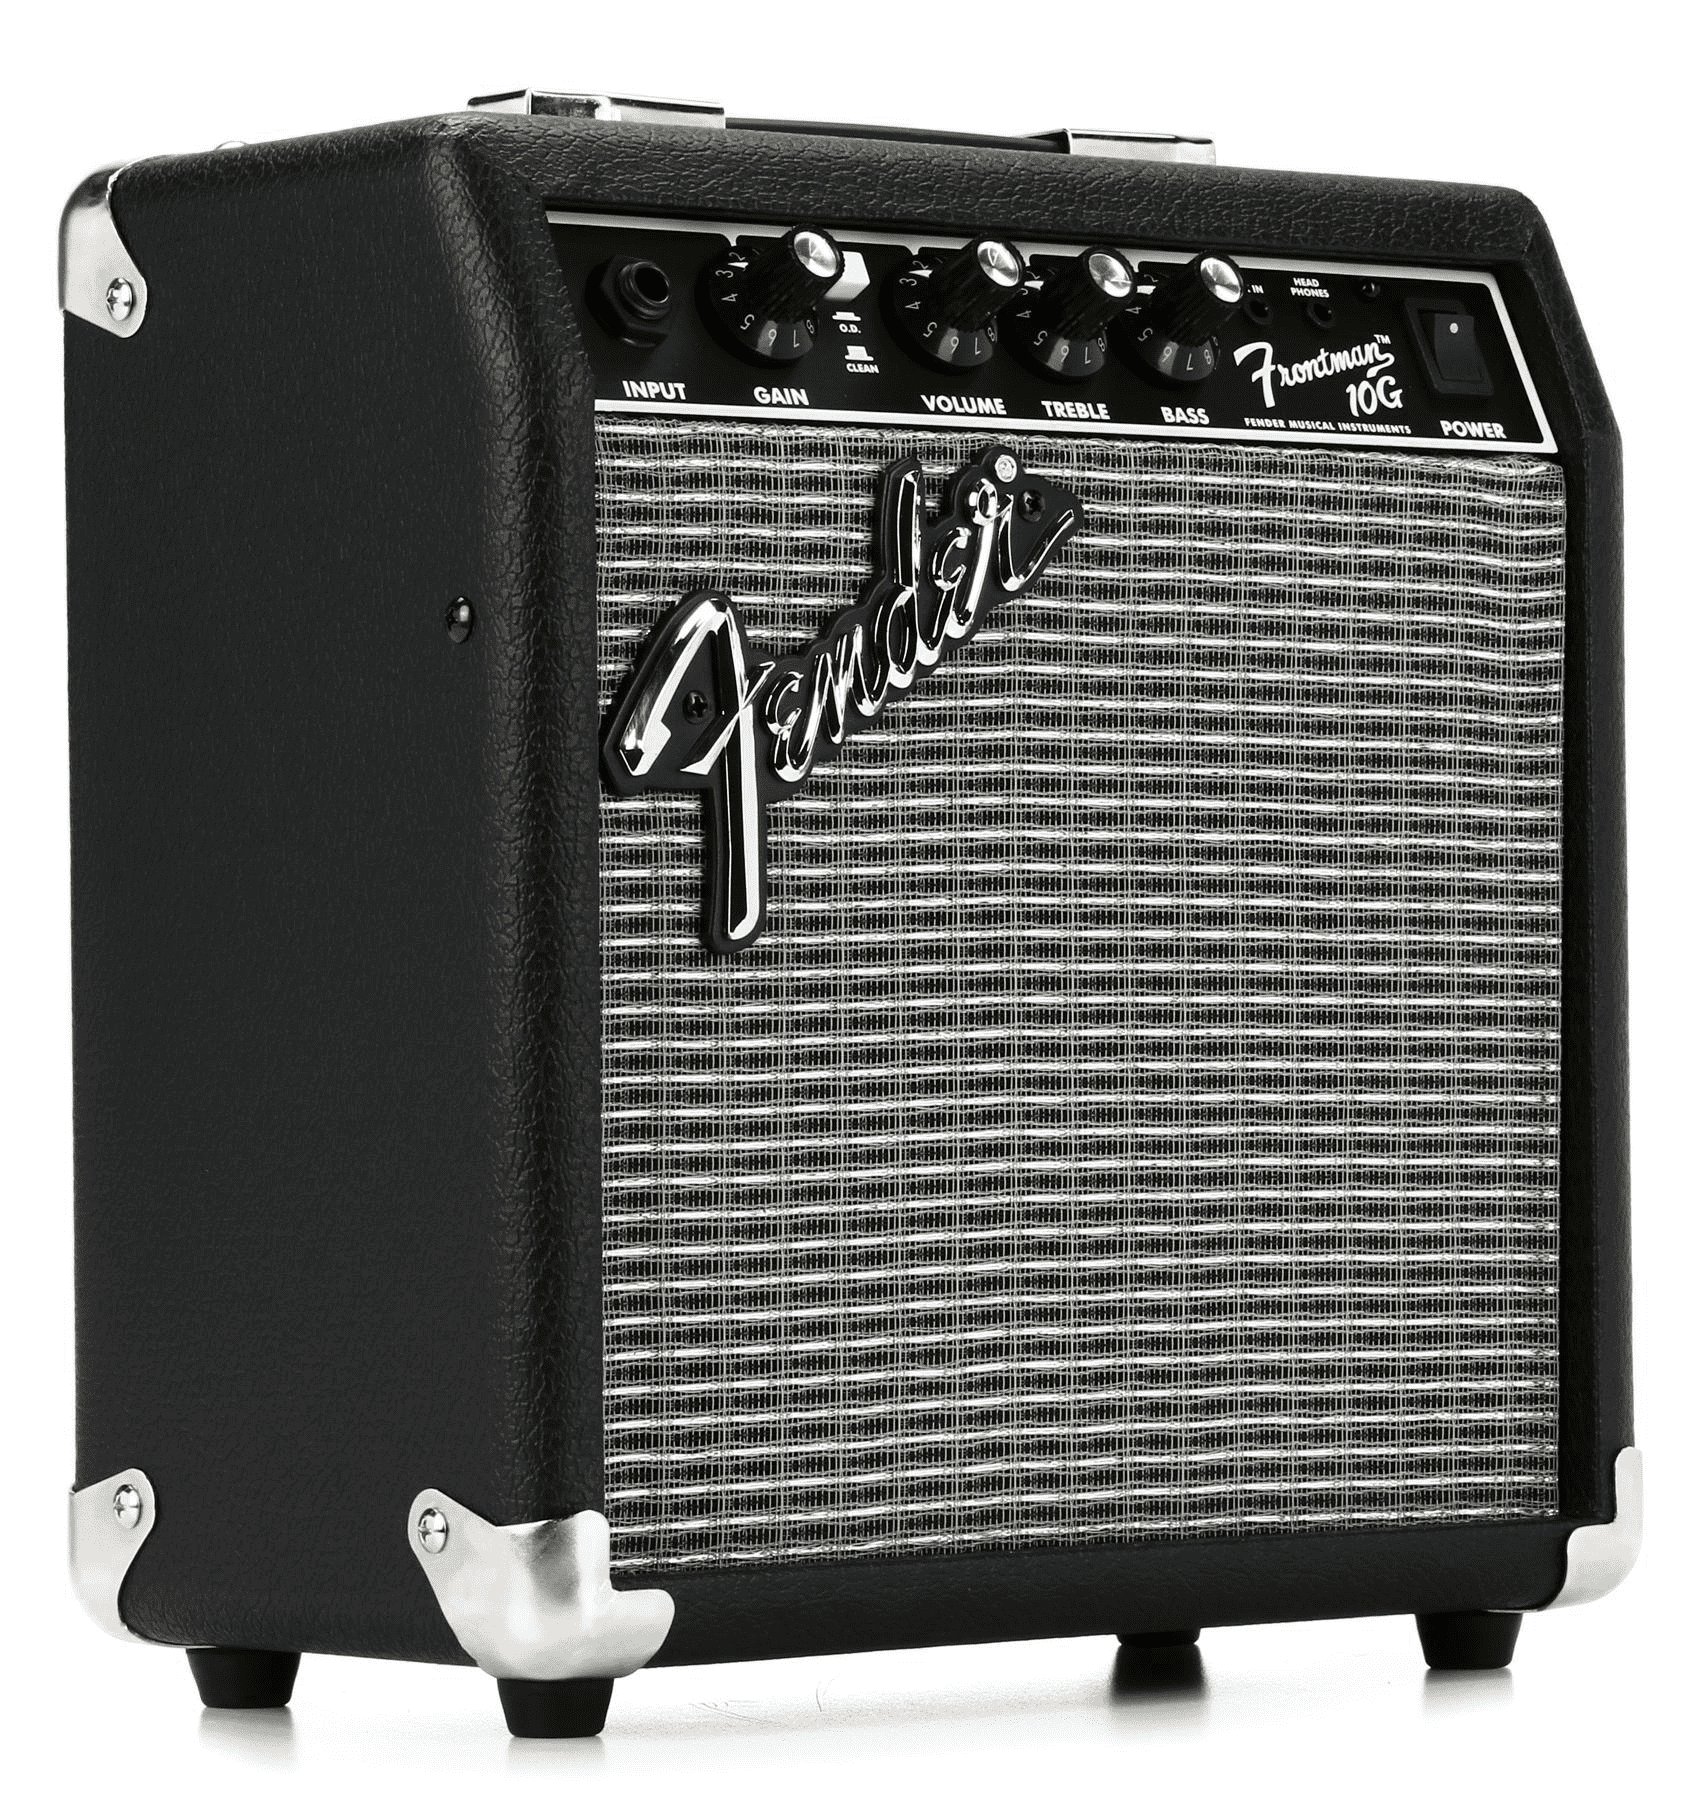 Fender Frontman 10G Electric Guitar Amplifier Review